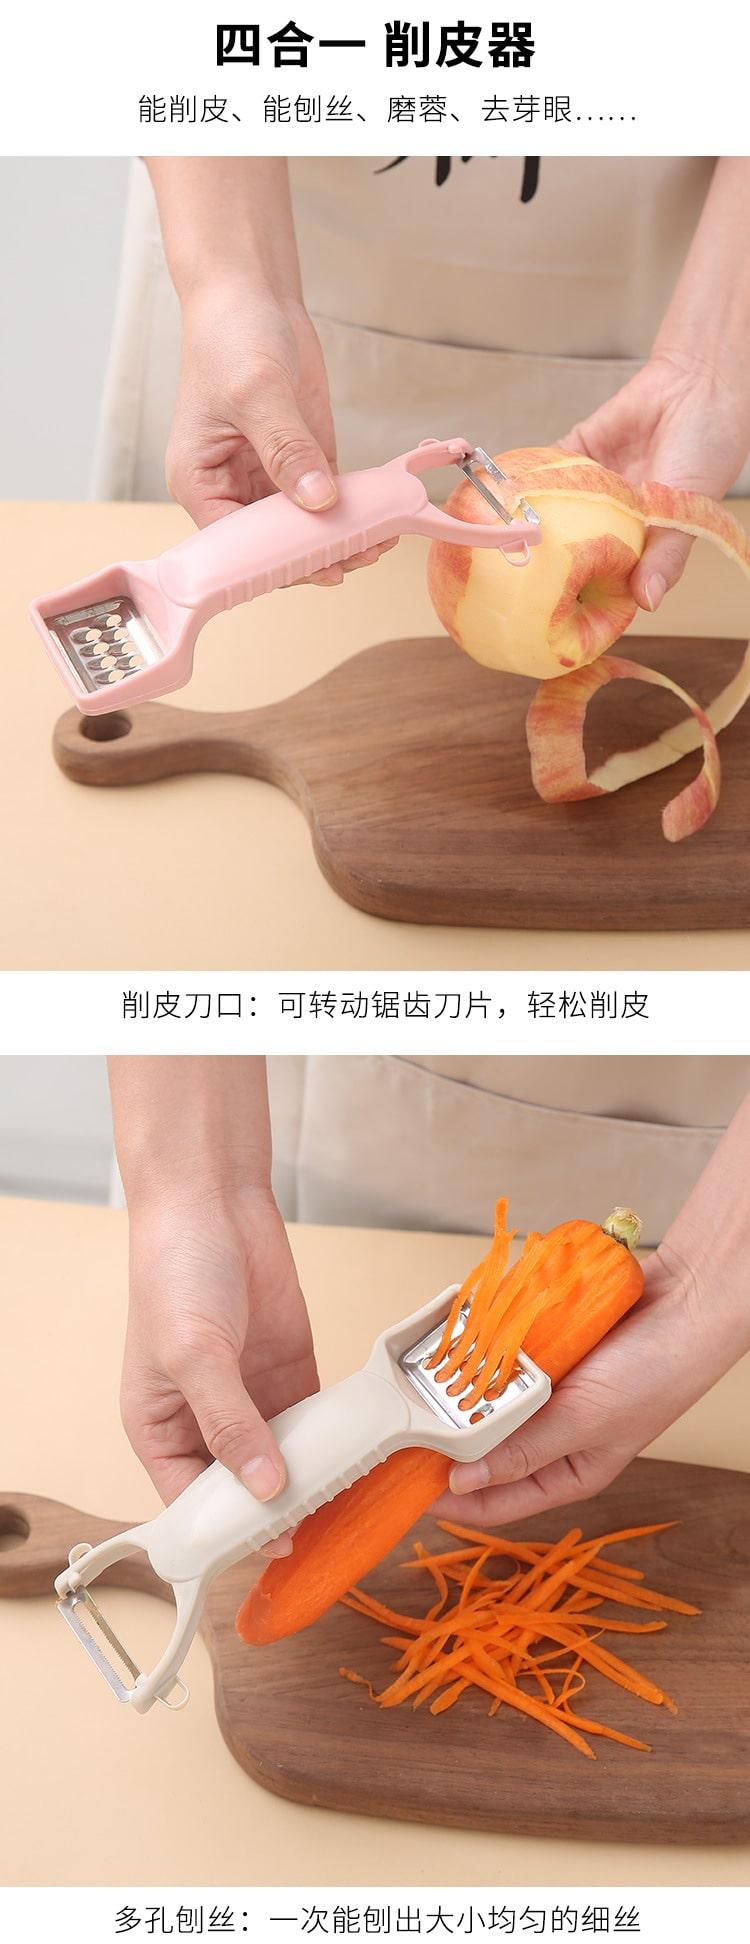 Multi-Purpose Peeler - Features